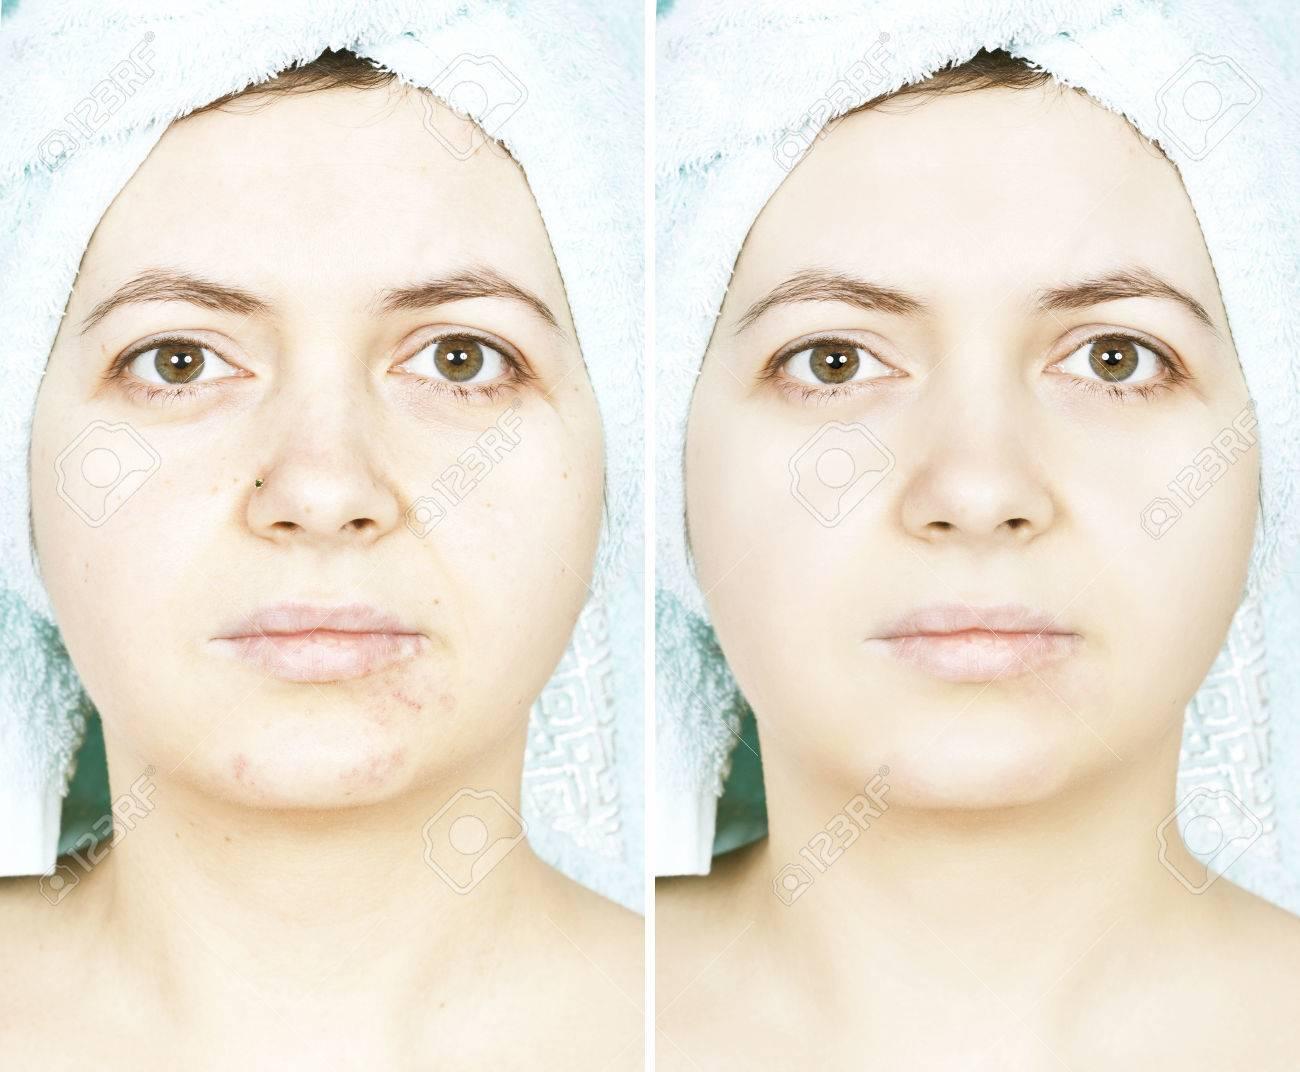 http://n3.datasn.io/data/api/v1/n3zm/image_of_skin_disease_5/main/skin_disease_image_download//c5/45/26/12/c545261298ea298747883cbc43a91377eb673aff.jpg